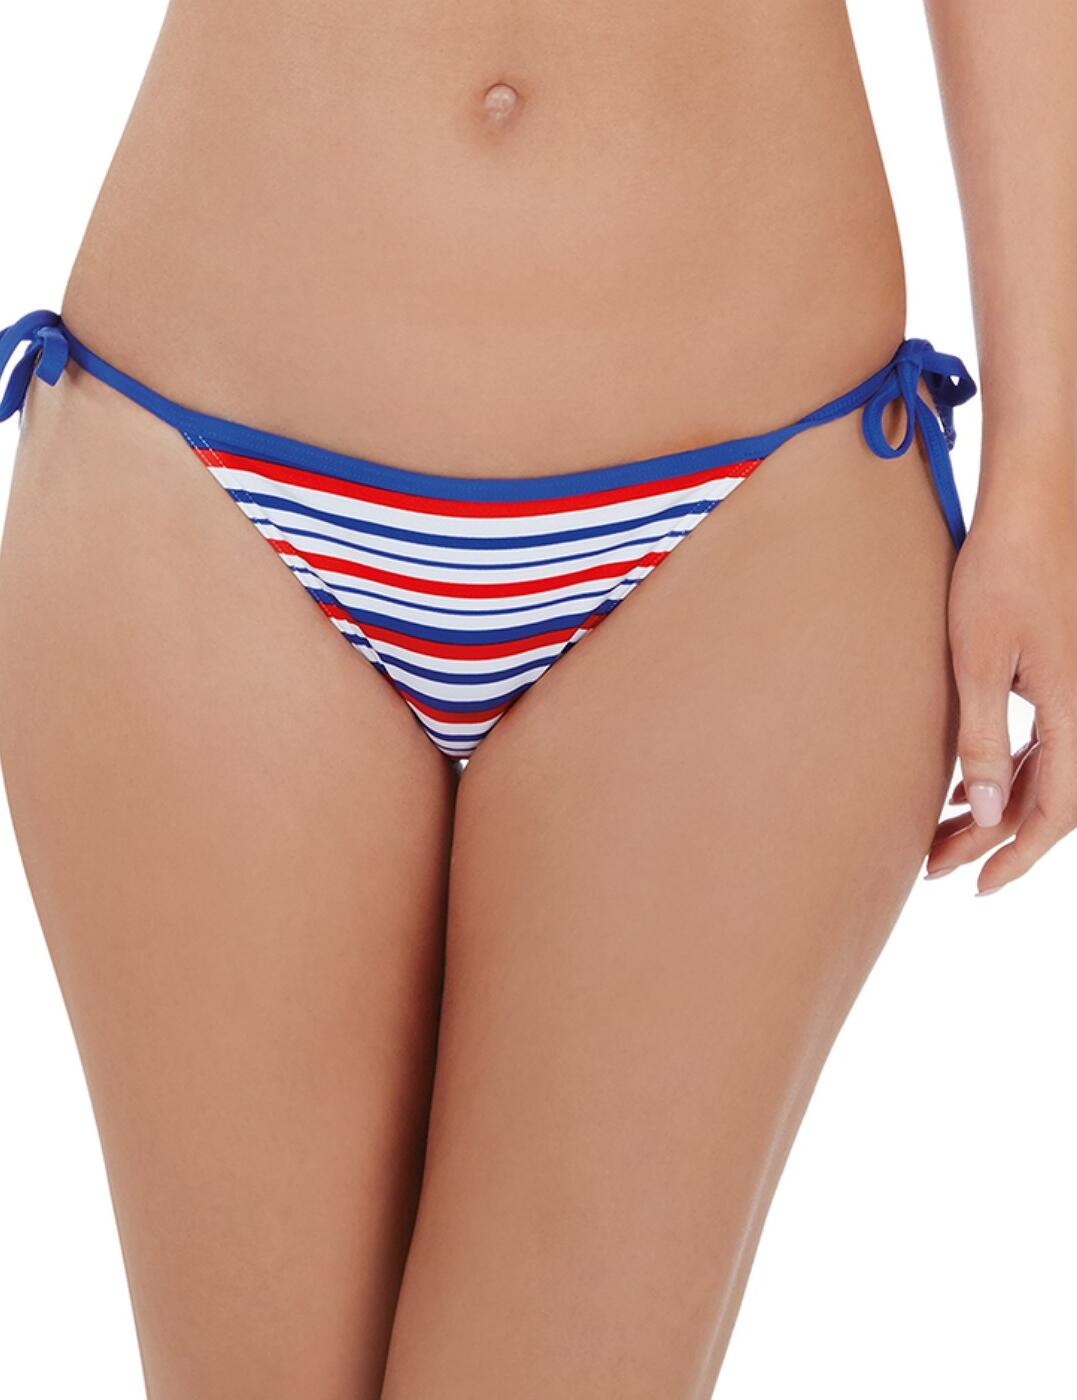 1686720 Lepel Sailor Tie Side Bikini Pant - 1686720 Blue/Red/White